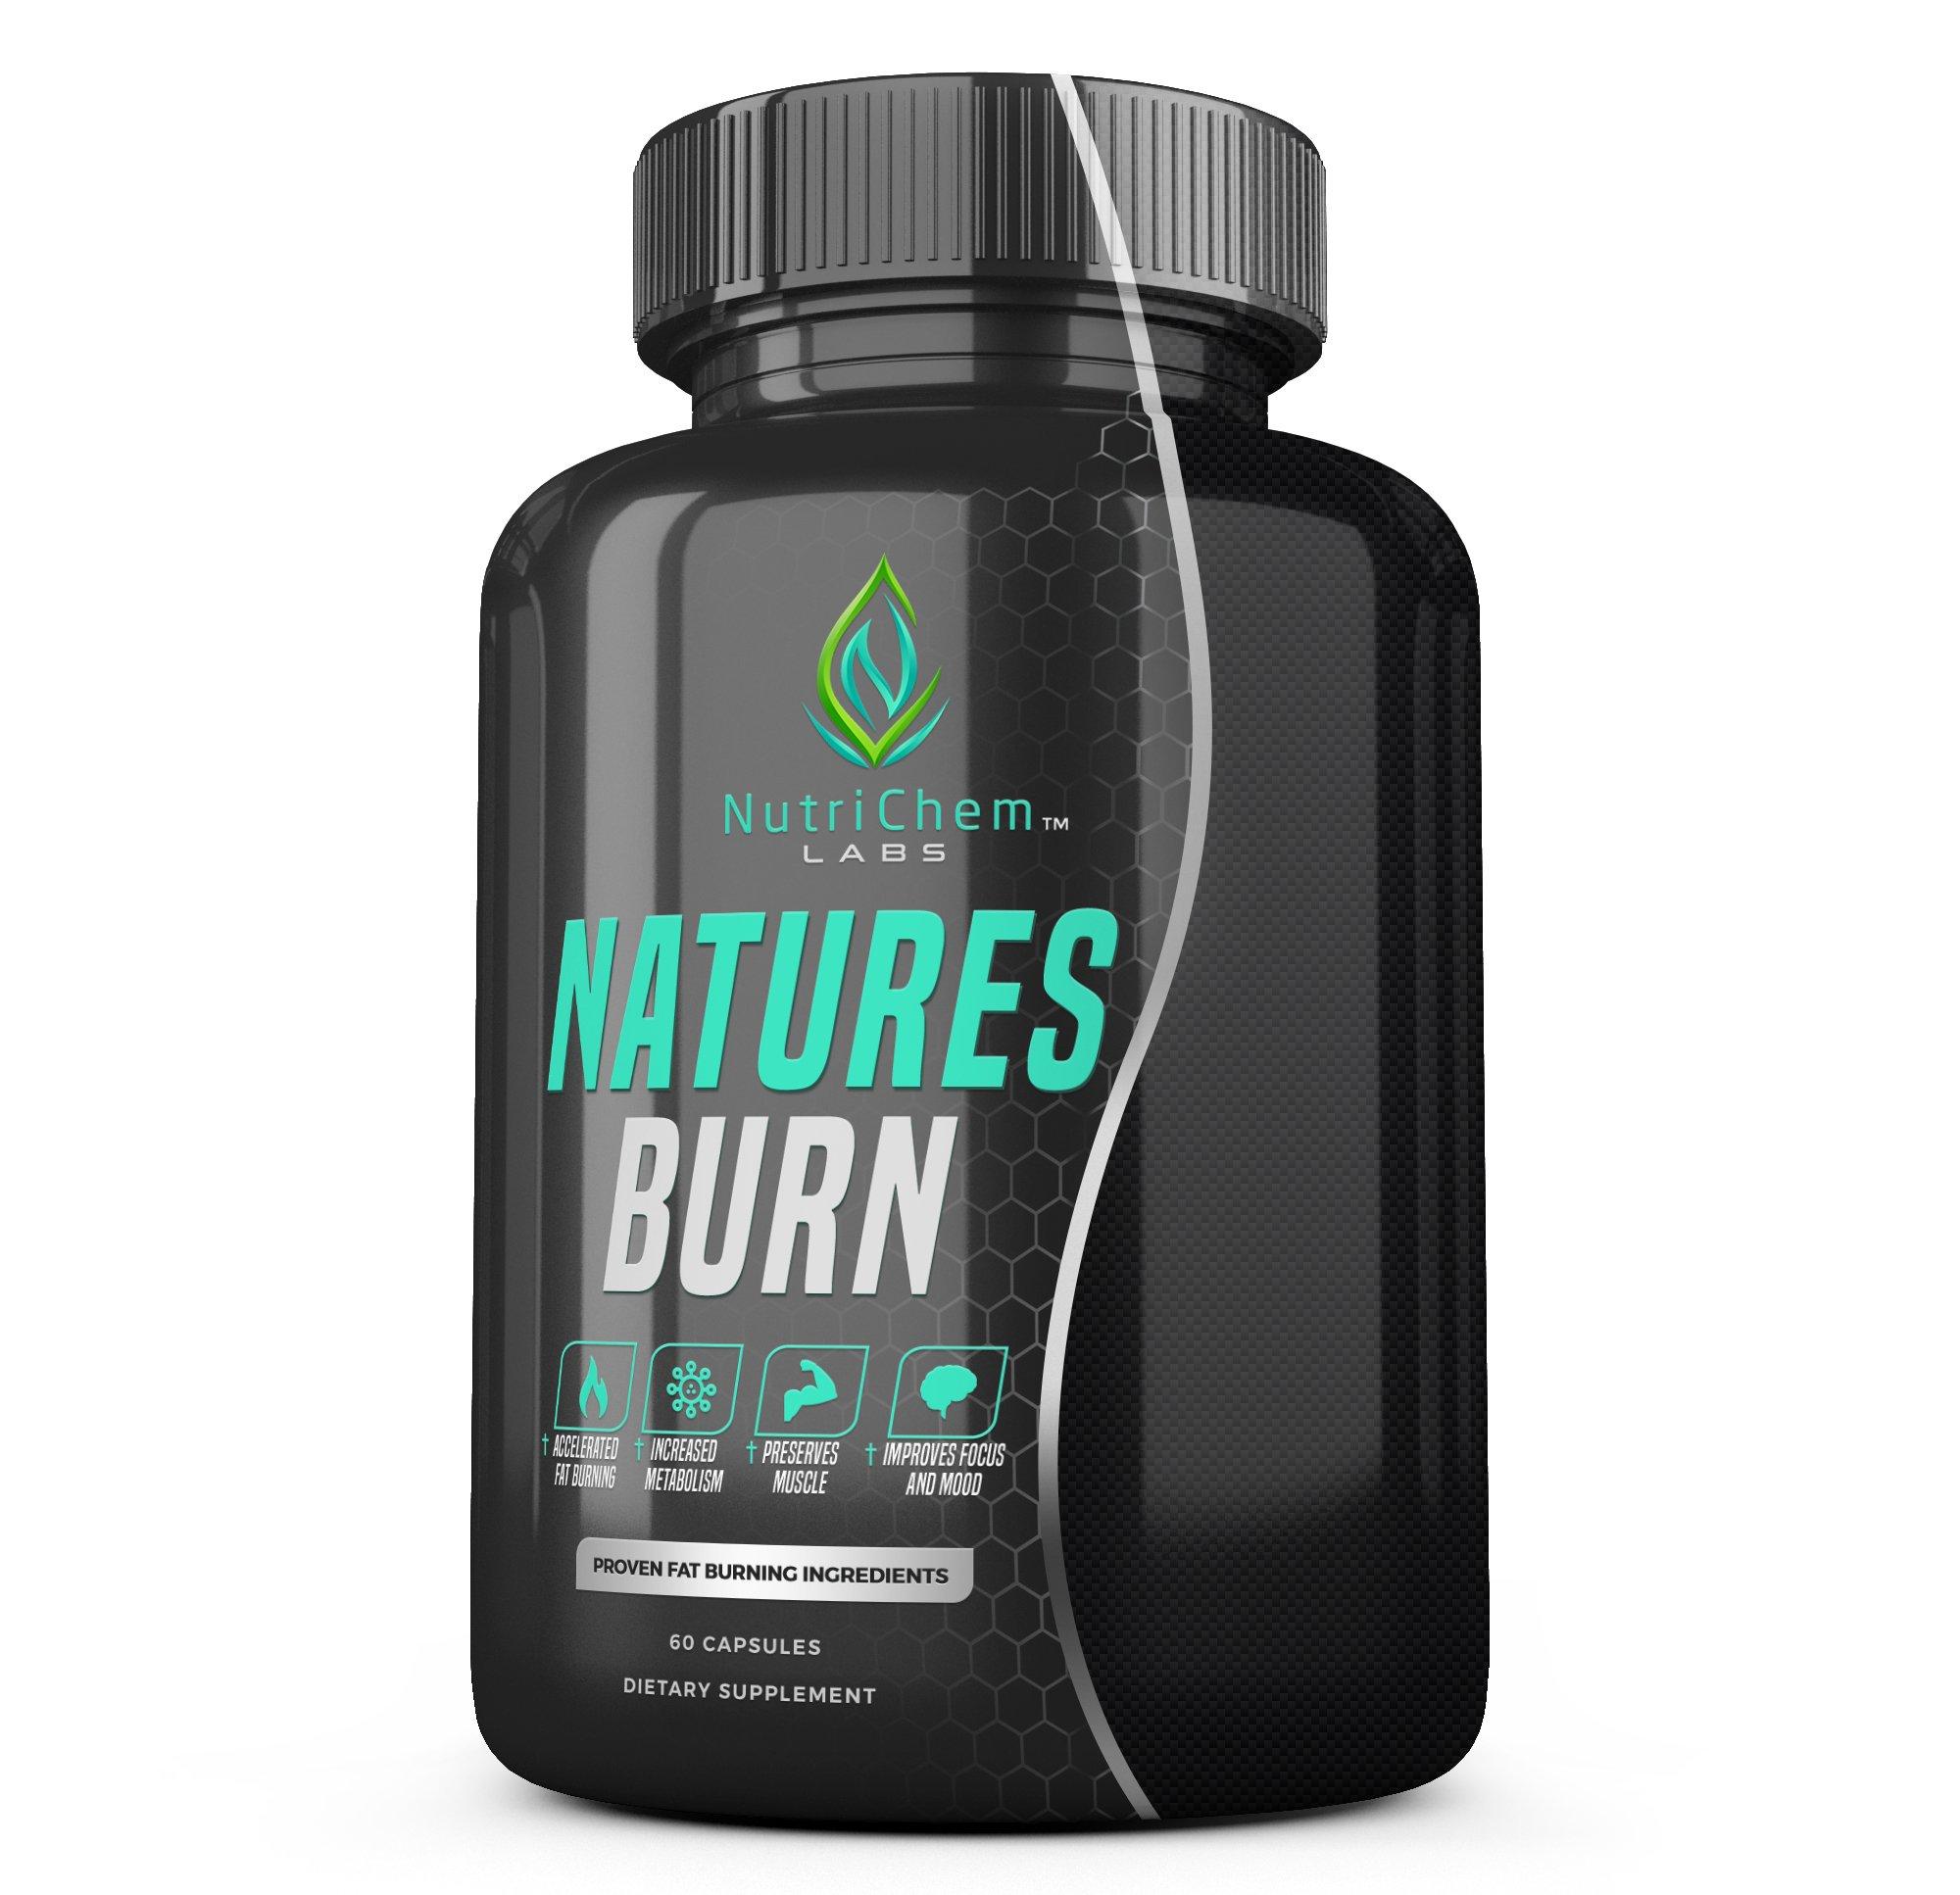 NATURES BURN - Fat Burner, Appetite Suppressant and Muscle Preserving Amino Acids - 60 Vegetarian Capsules